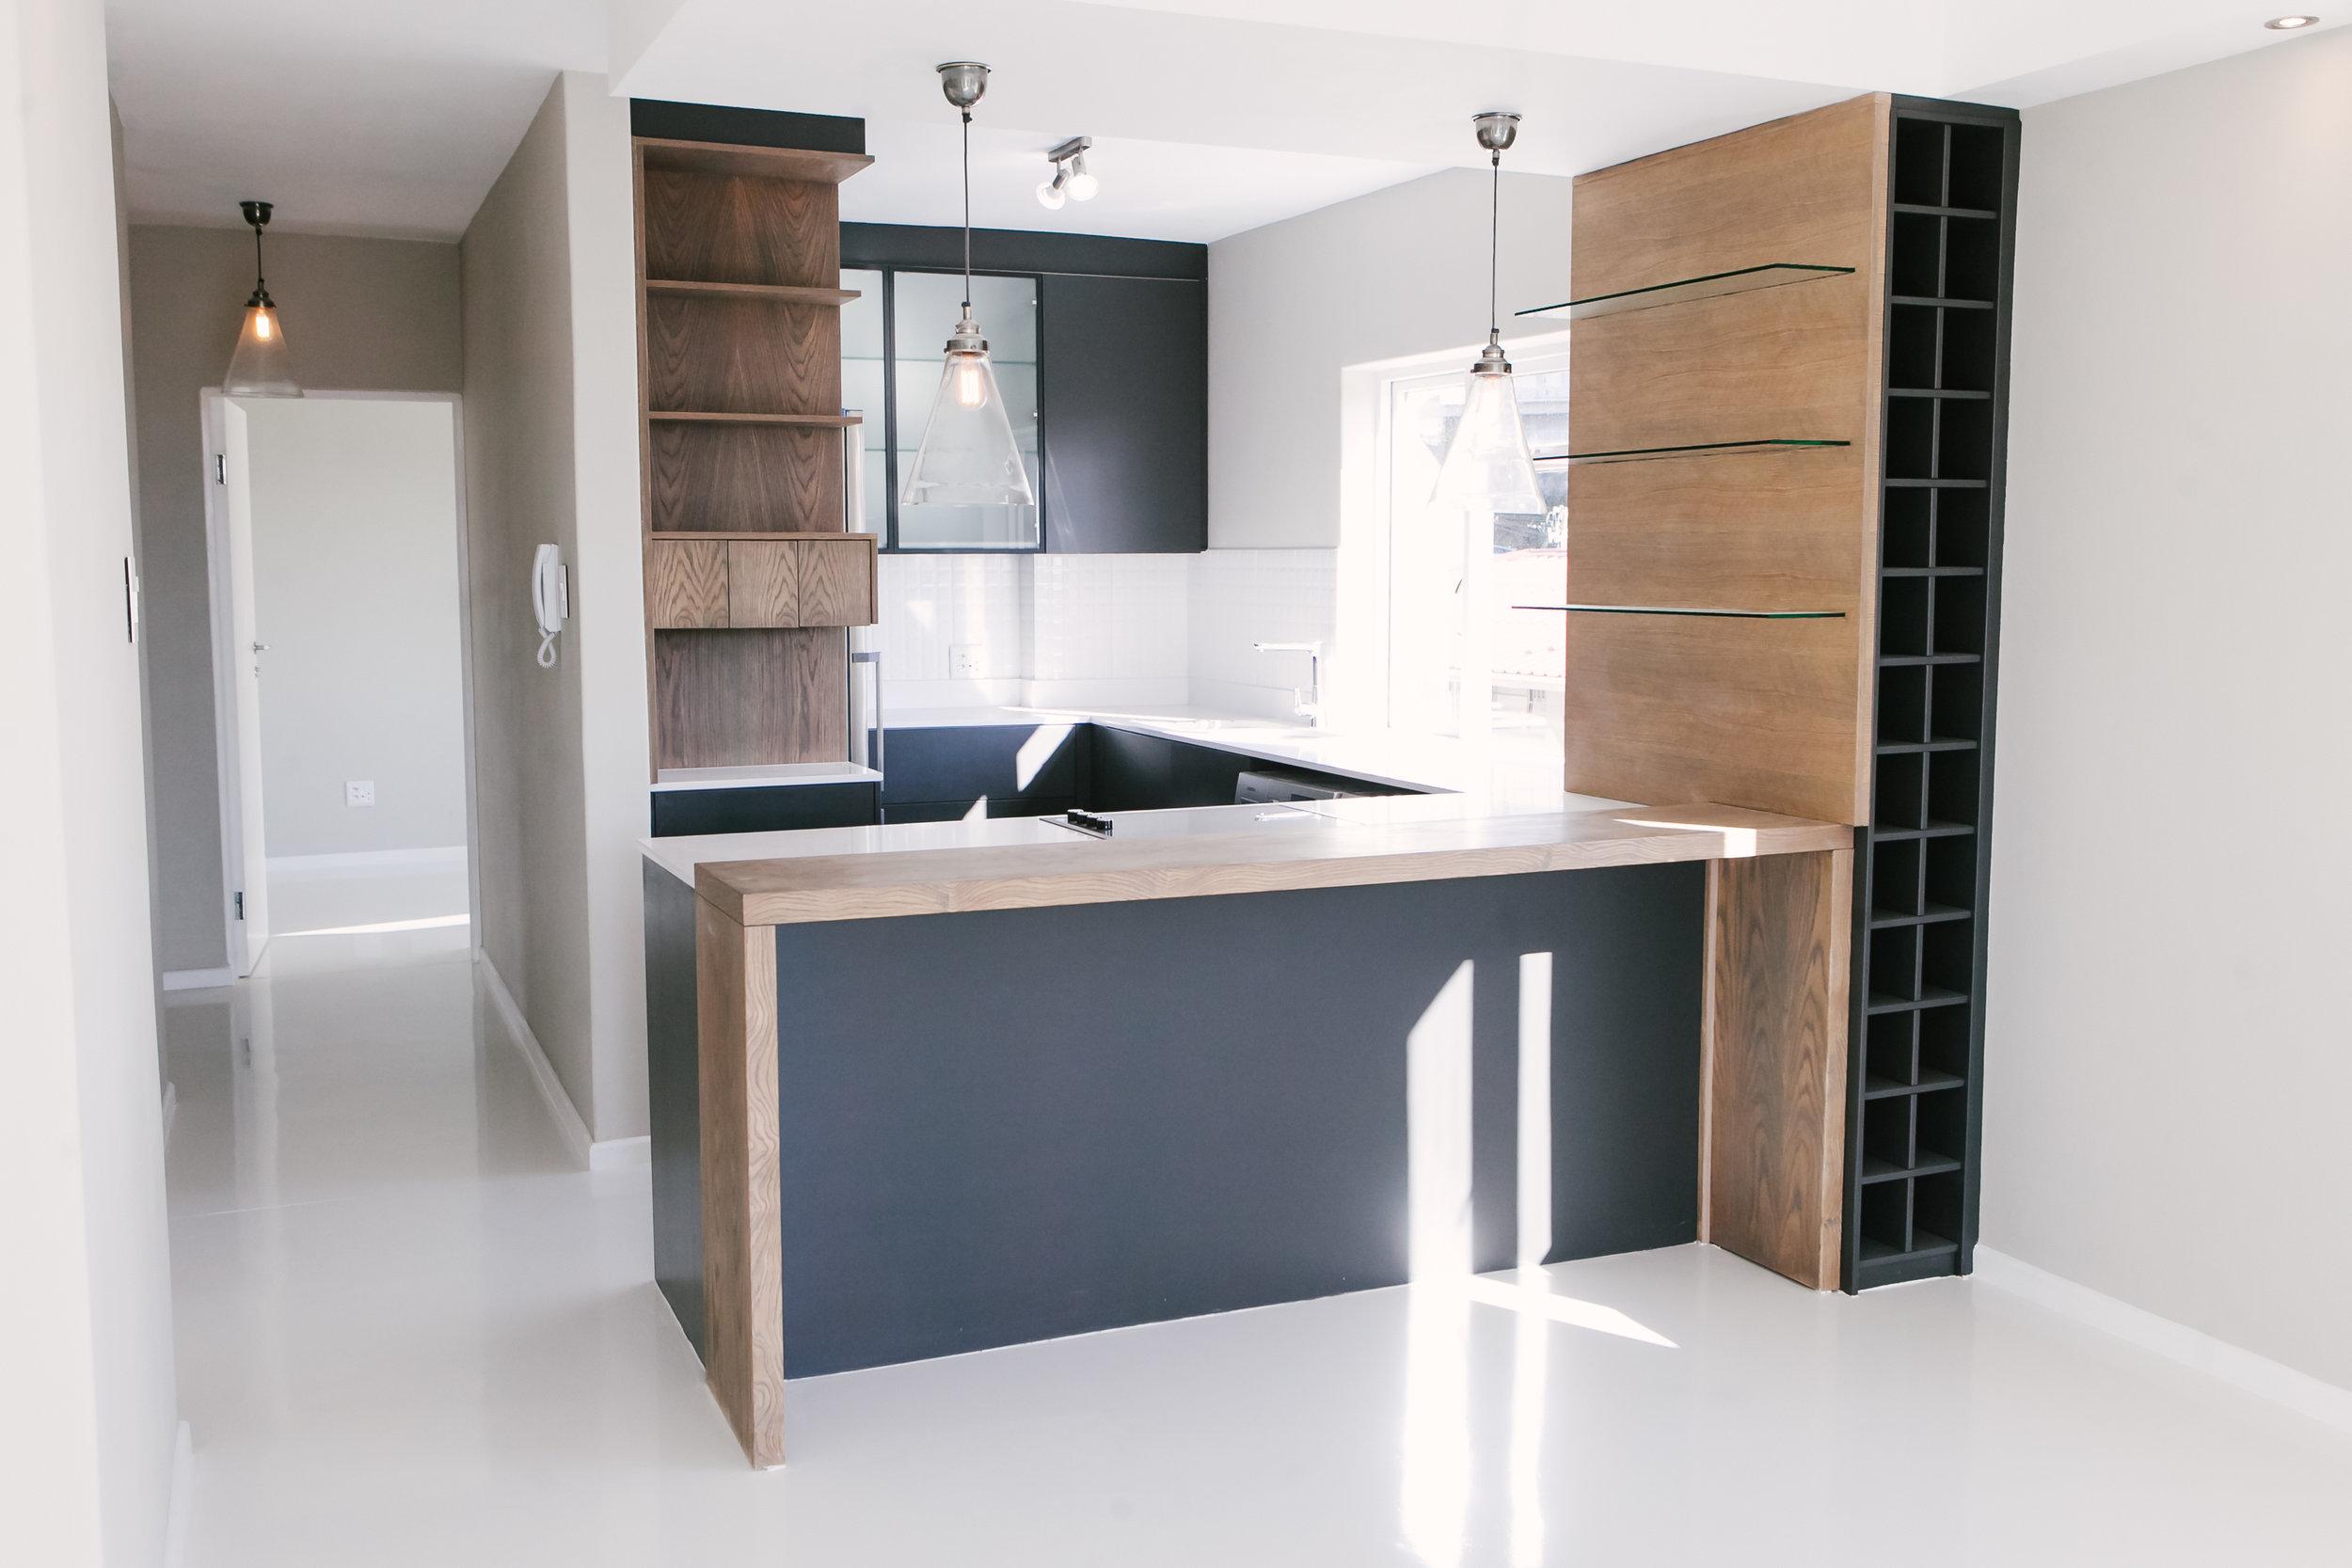 Greenpoint apartment kitchen 1.jpg